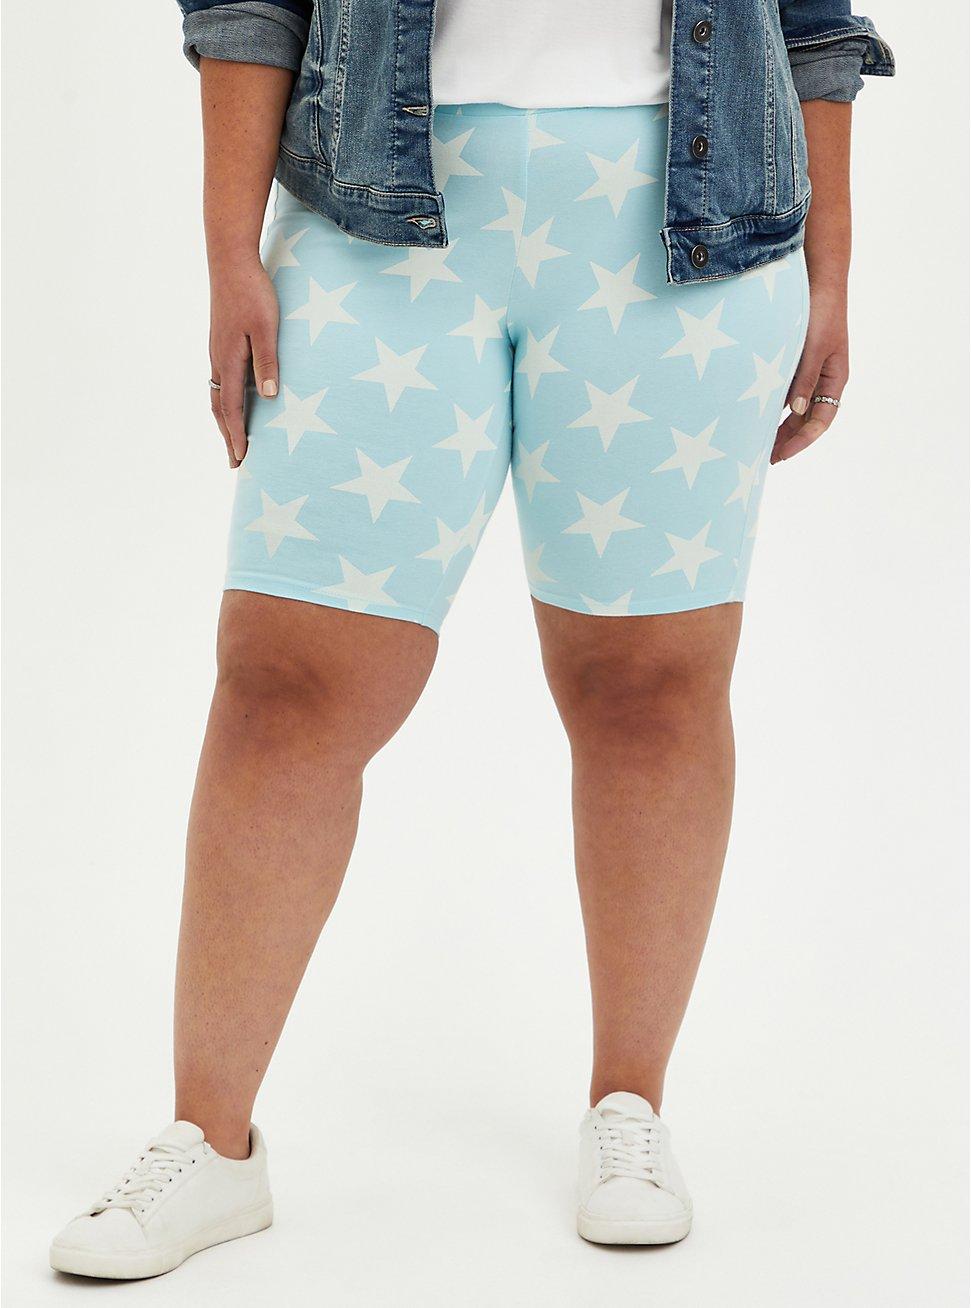 Blue & White Stars Short, MULTI COLOR, hi-res